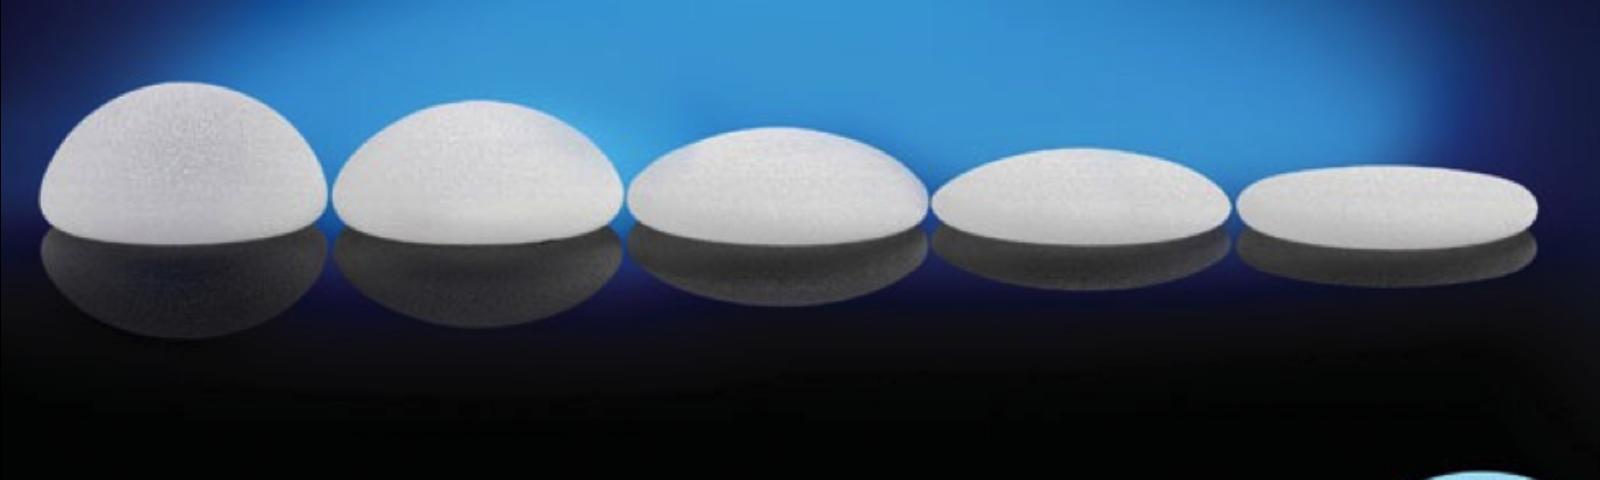 Implant sizes natrelle